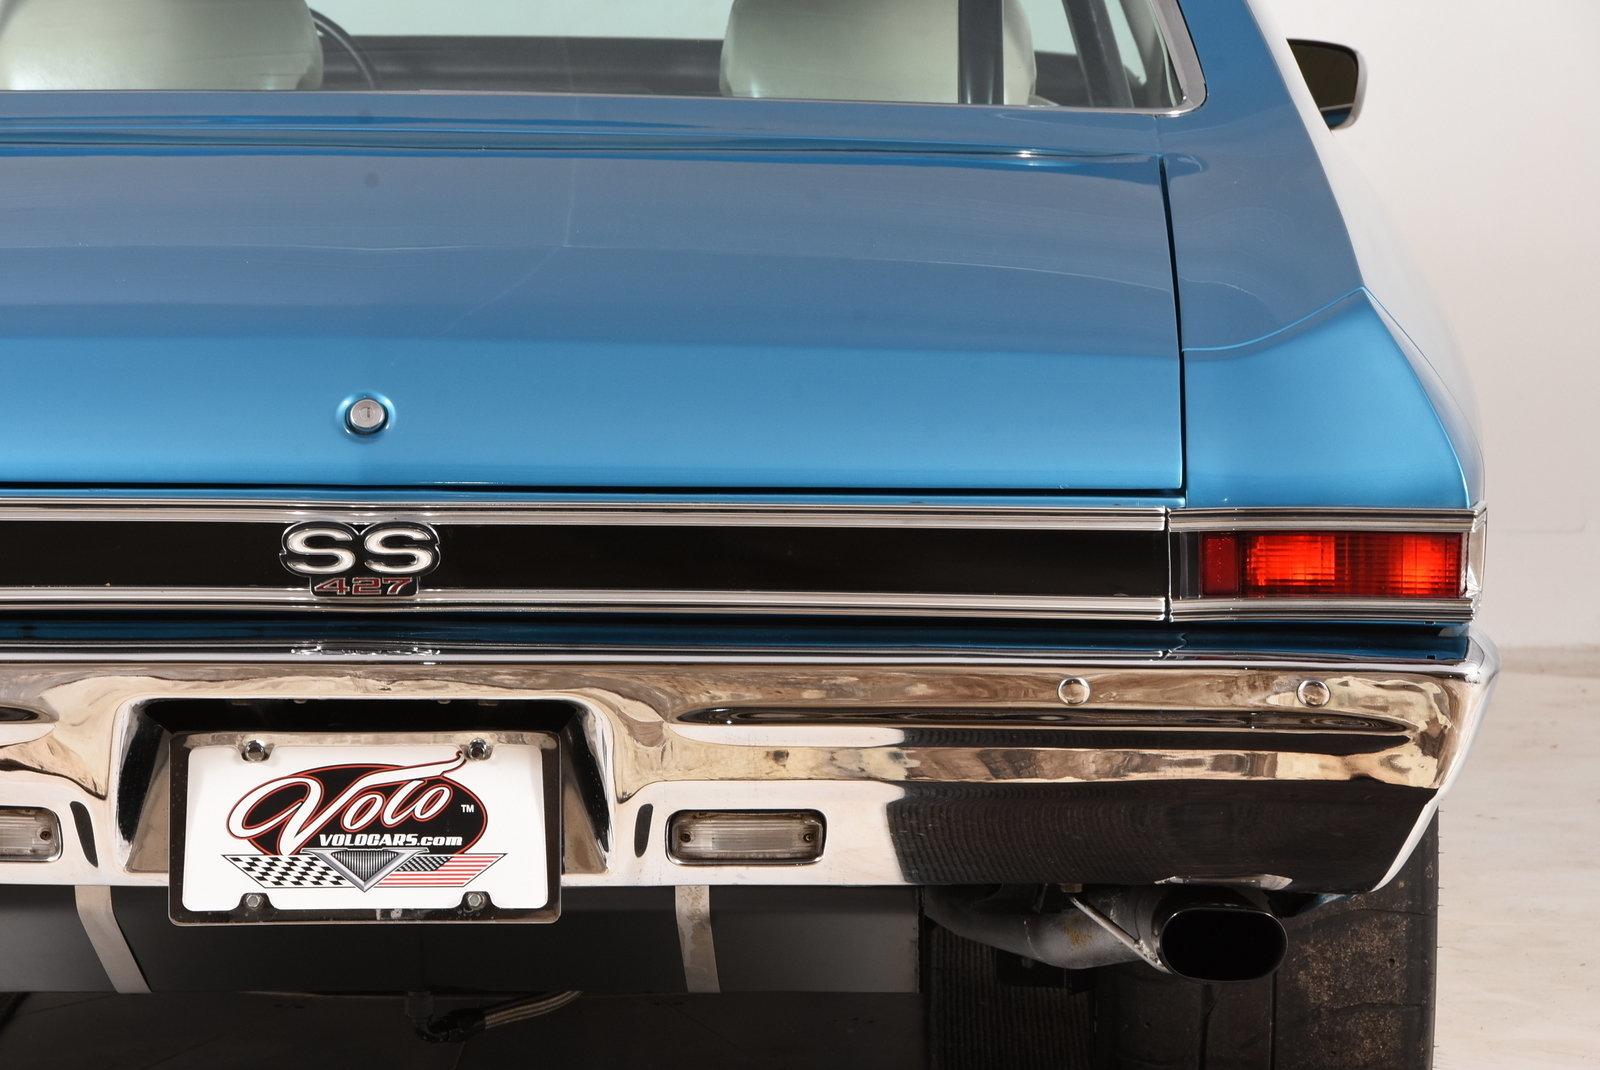 1968 Chevrolet Chevelle Ss For Sale 100136 Mcg